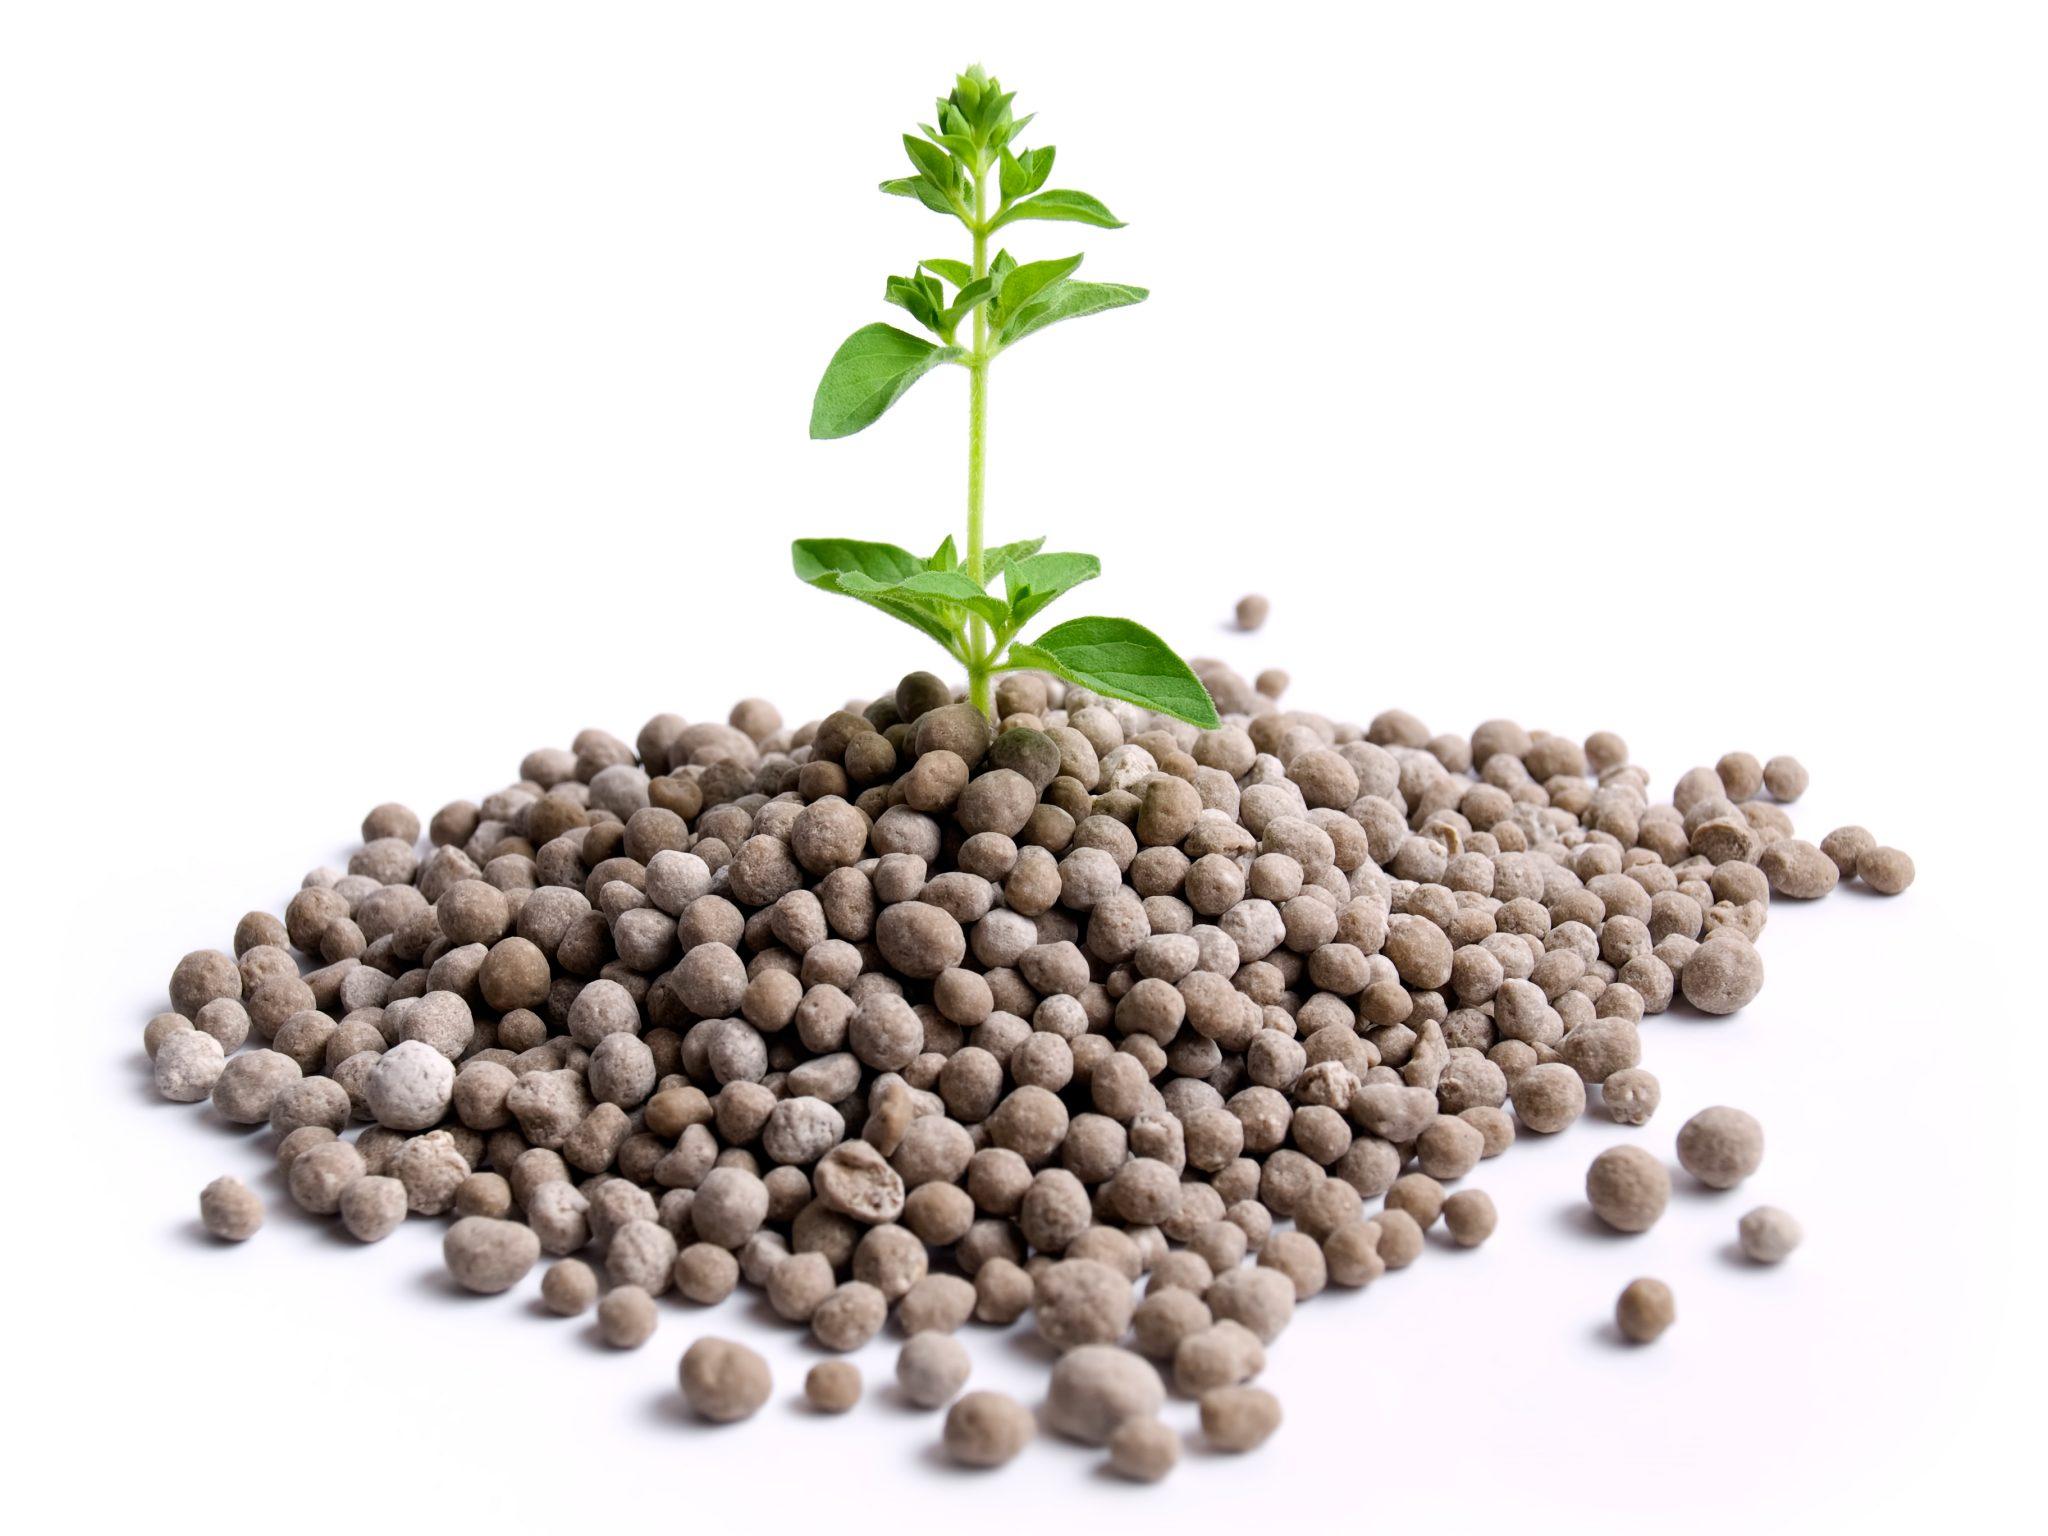 Global Fertilizer Additives Market Research Report Analysis 2019 Focusing on Top Companies like Solvay, Calnetix Technologies, LLC., Cameron Chemicals, Europiren B.V., Golden Grain Group Limited.